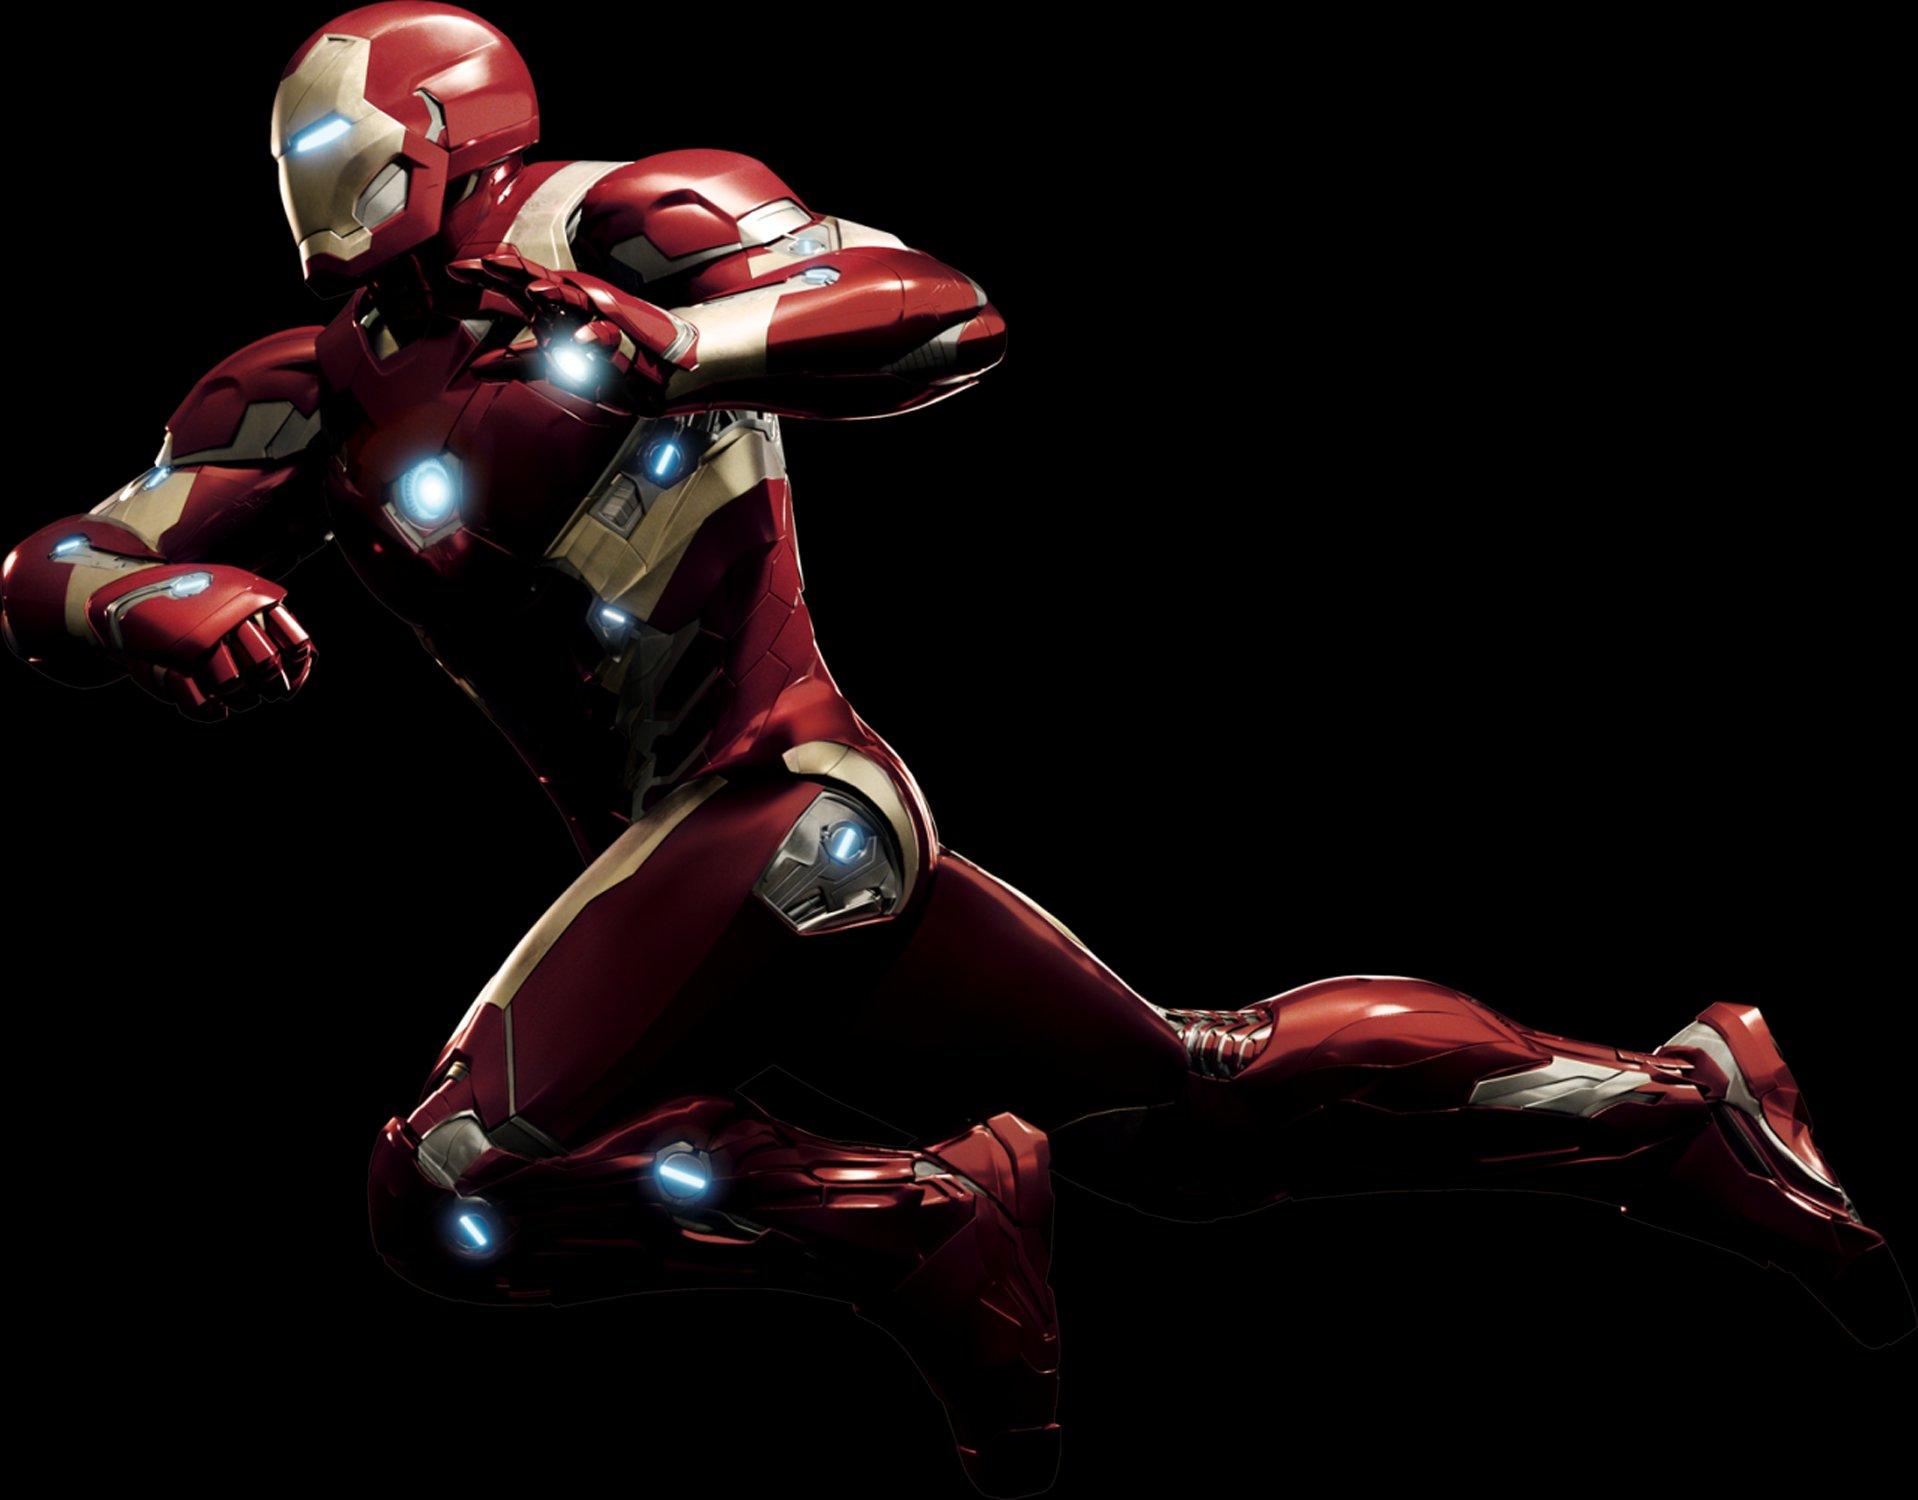 Marvel Comics Superhero 1918x1500